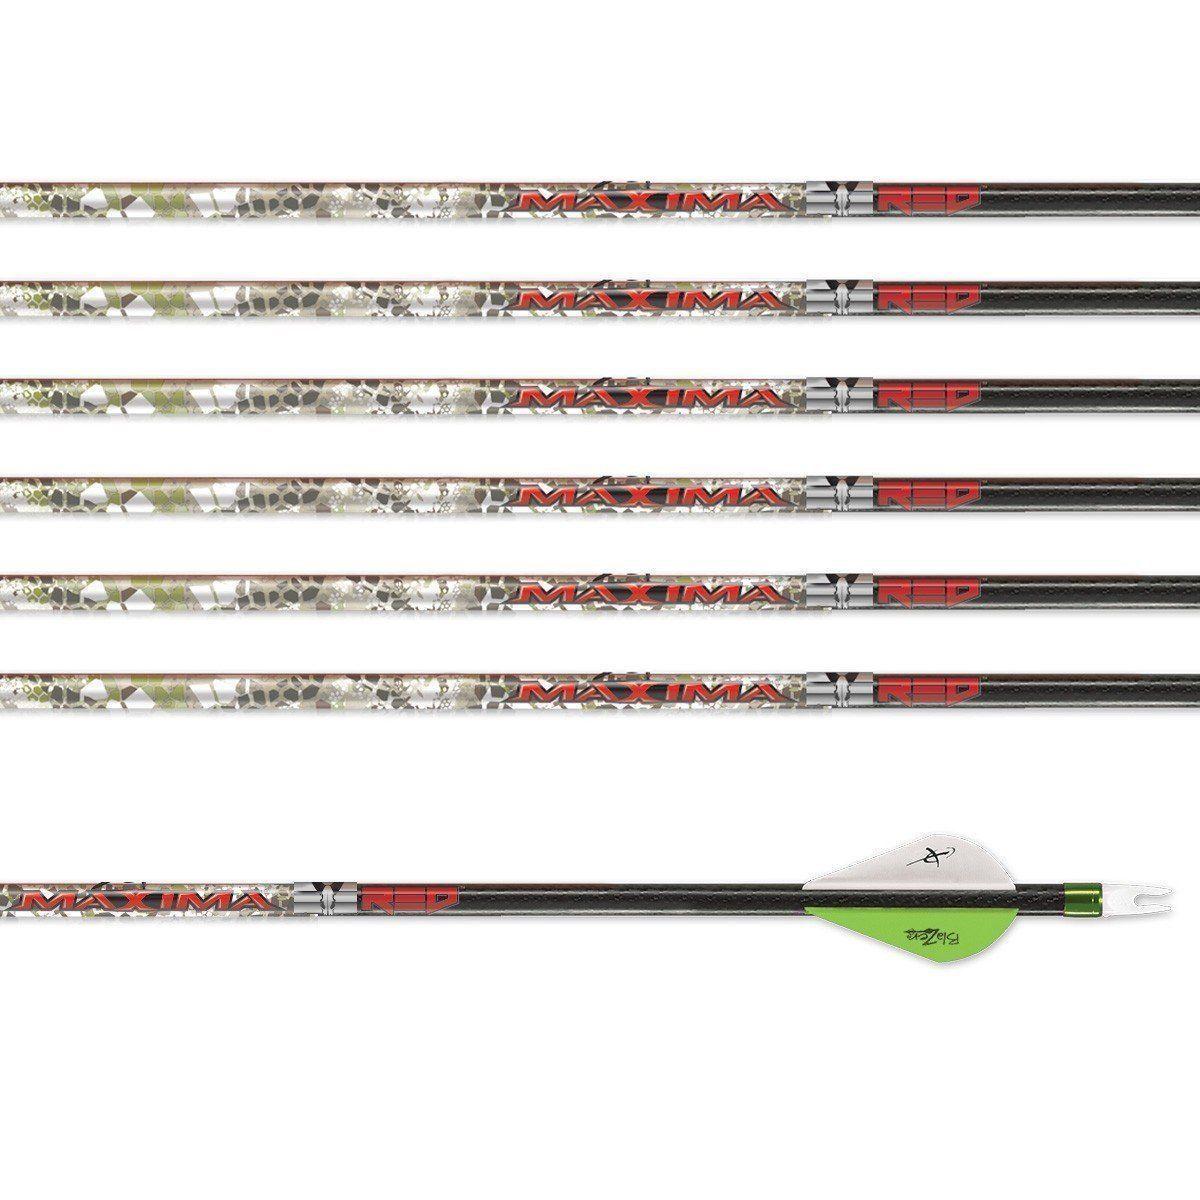 Carbon Express Arrow Maxima Red Badlands SD Blazer Vanes 6 Pack